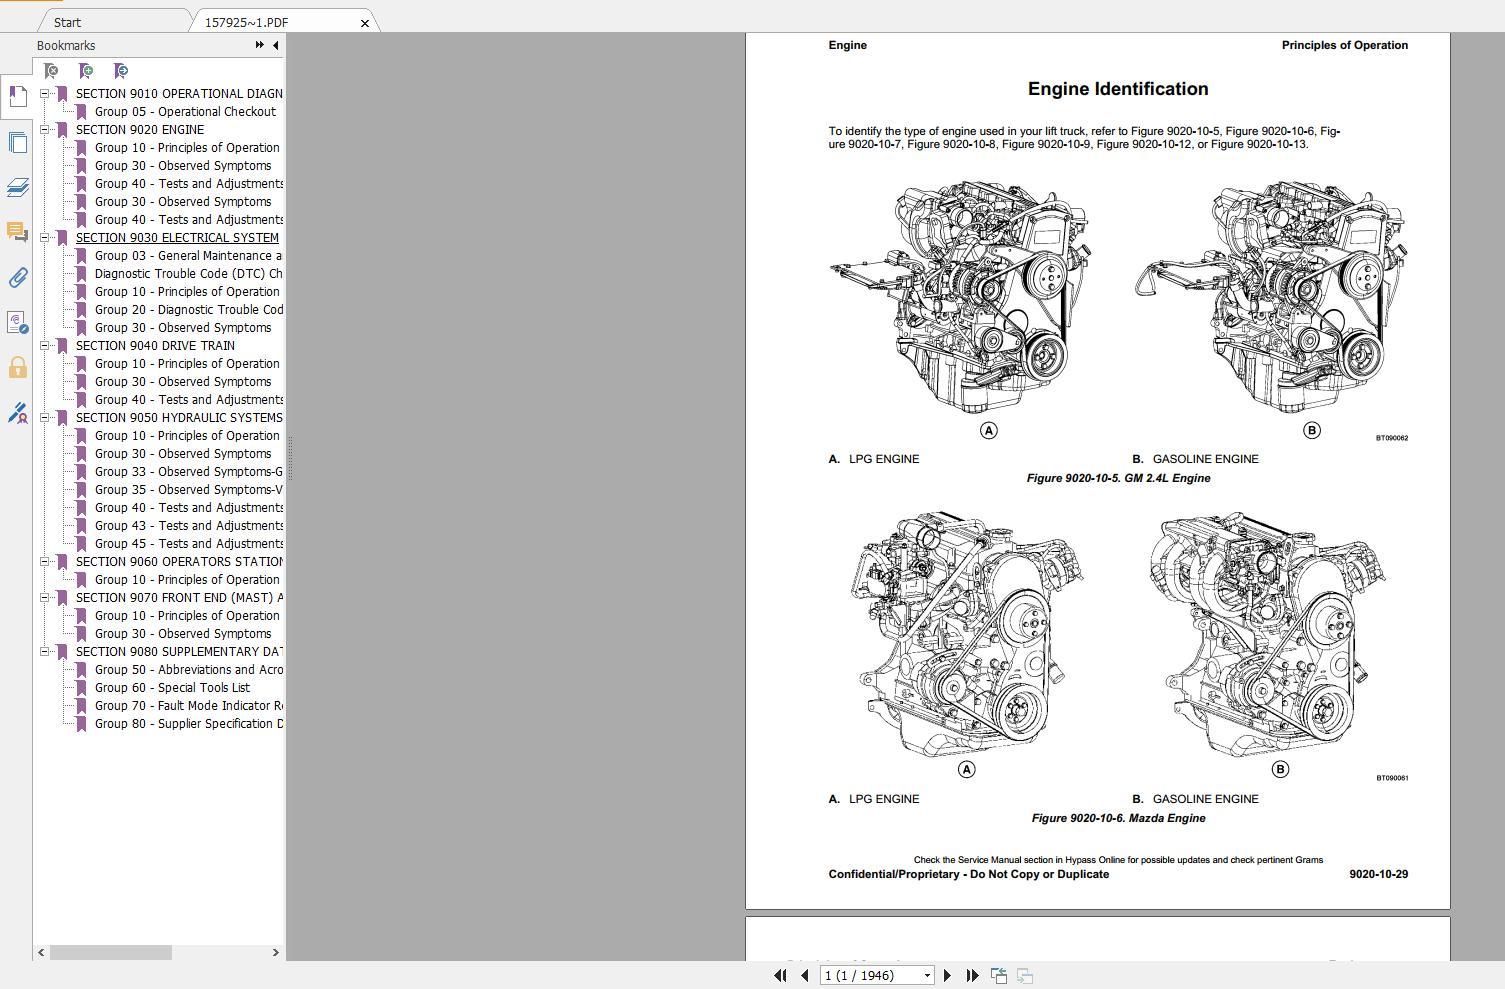 Hyster_Forklift_Class_4_Internal_Combustion_Engine_Trucks_Repair_Manuals8